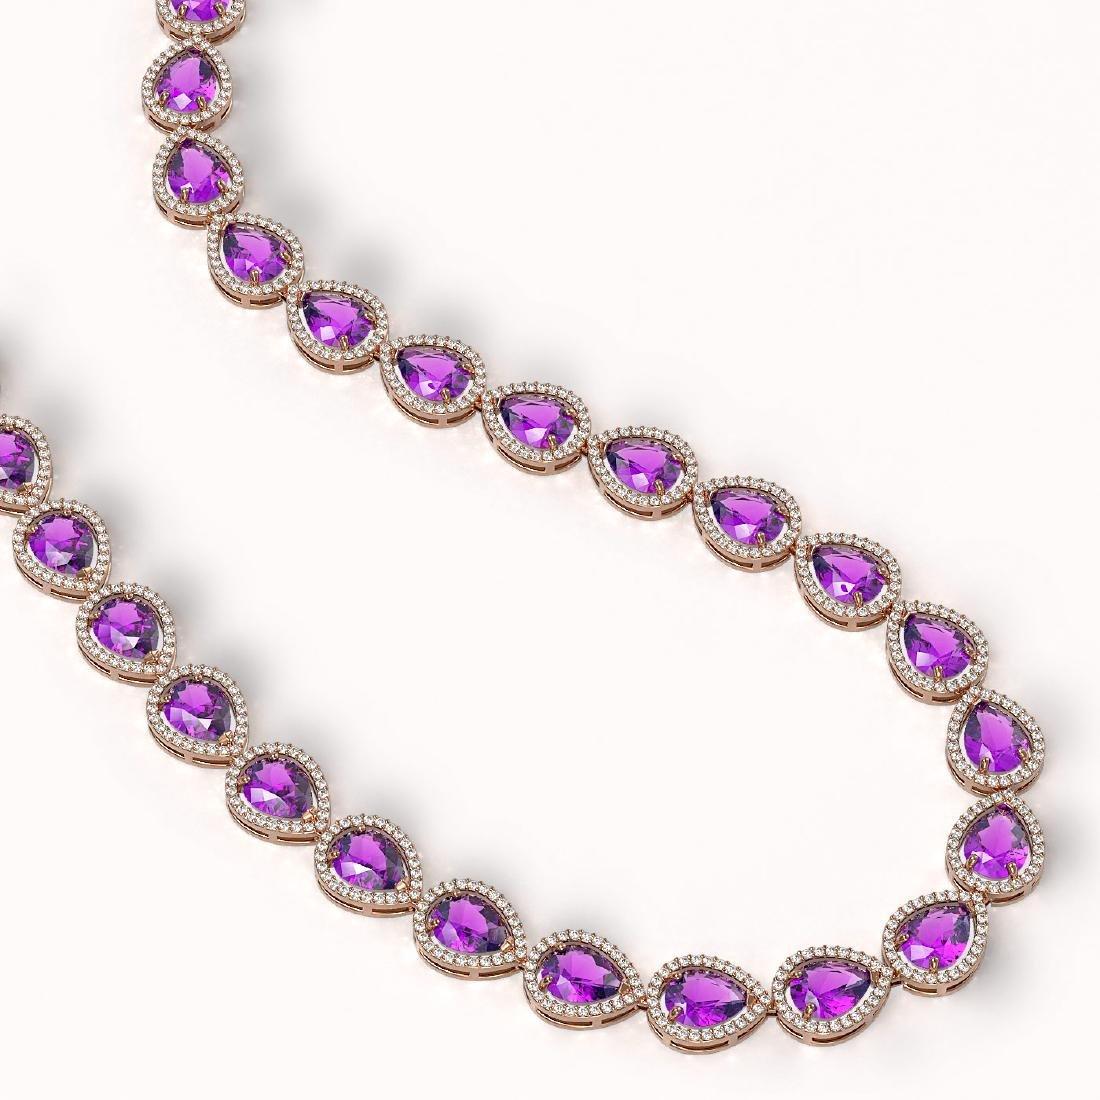 43.2 CTW Amethyst & Diamond Halo Necklace 10K Rose Gold - 2